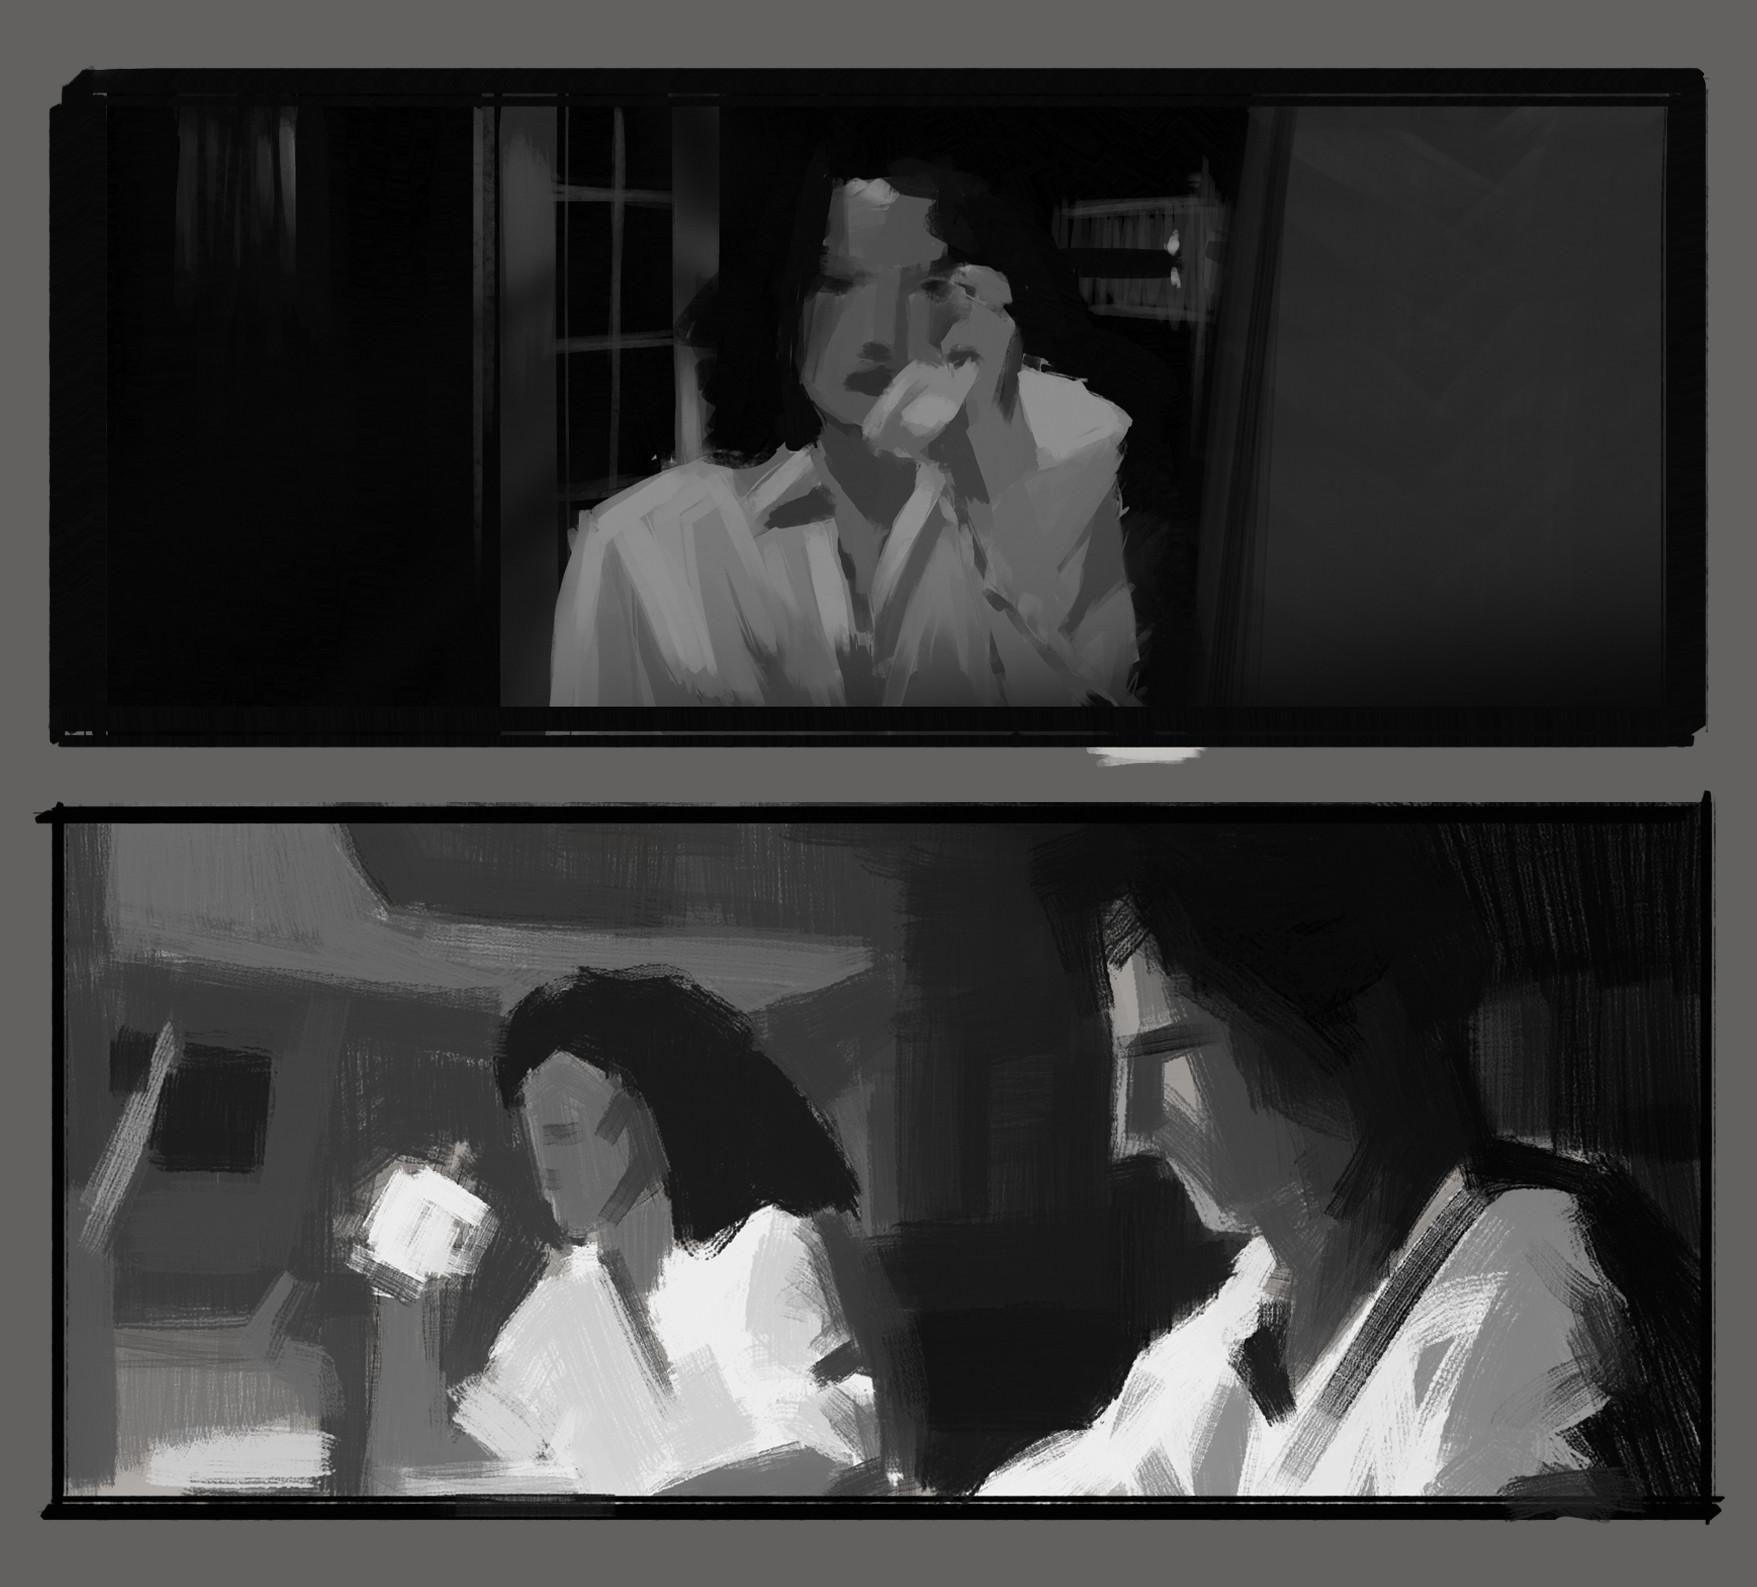 Ricardo guimaraes cinematic studies 04